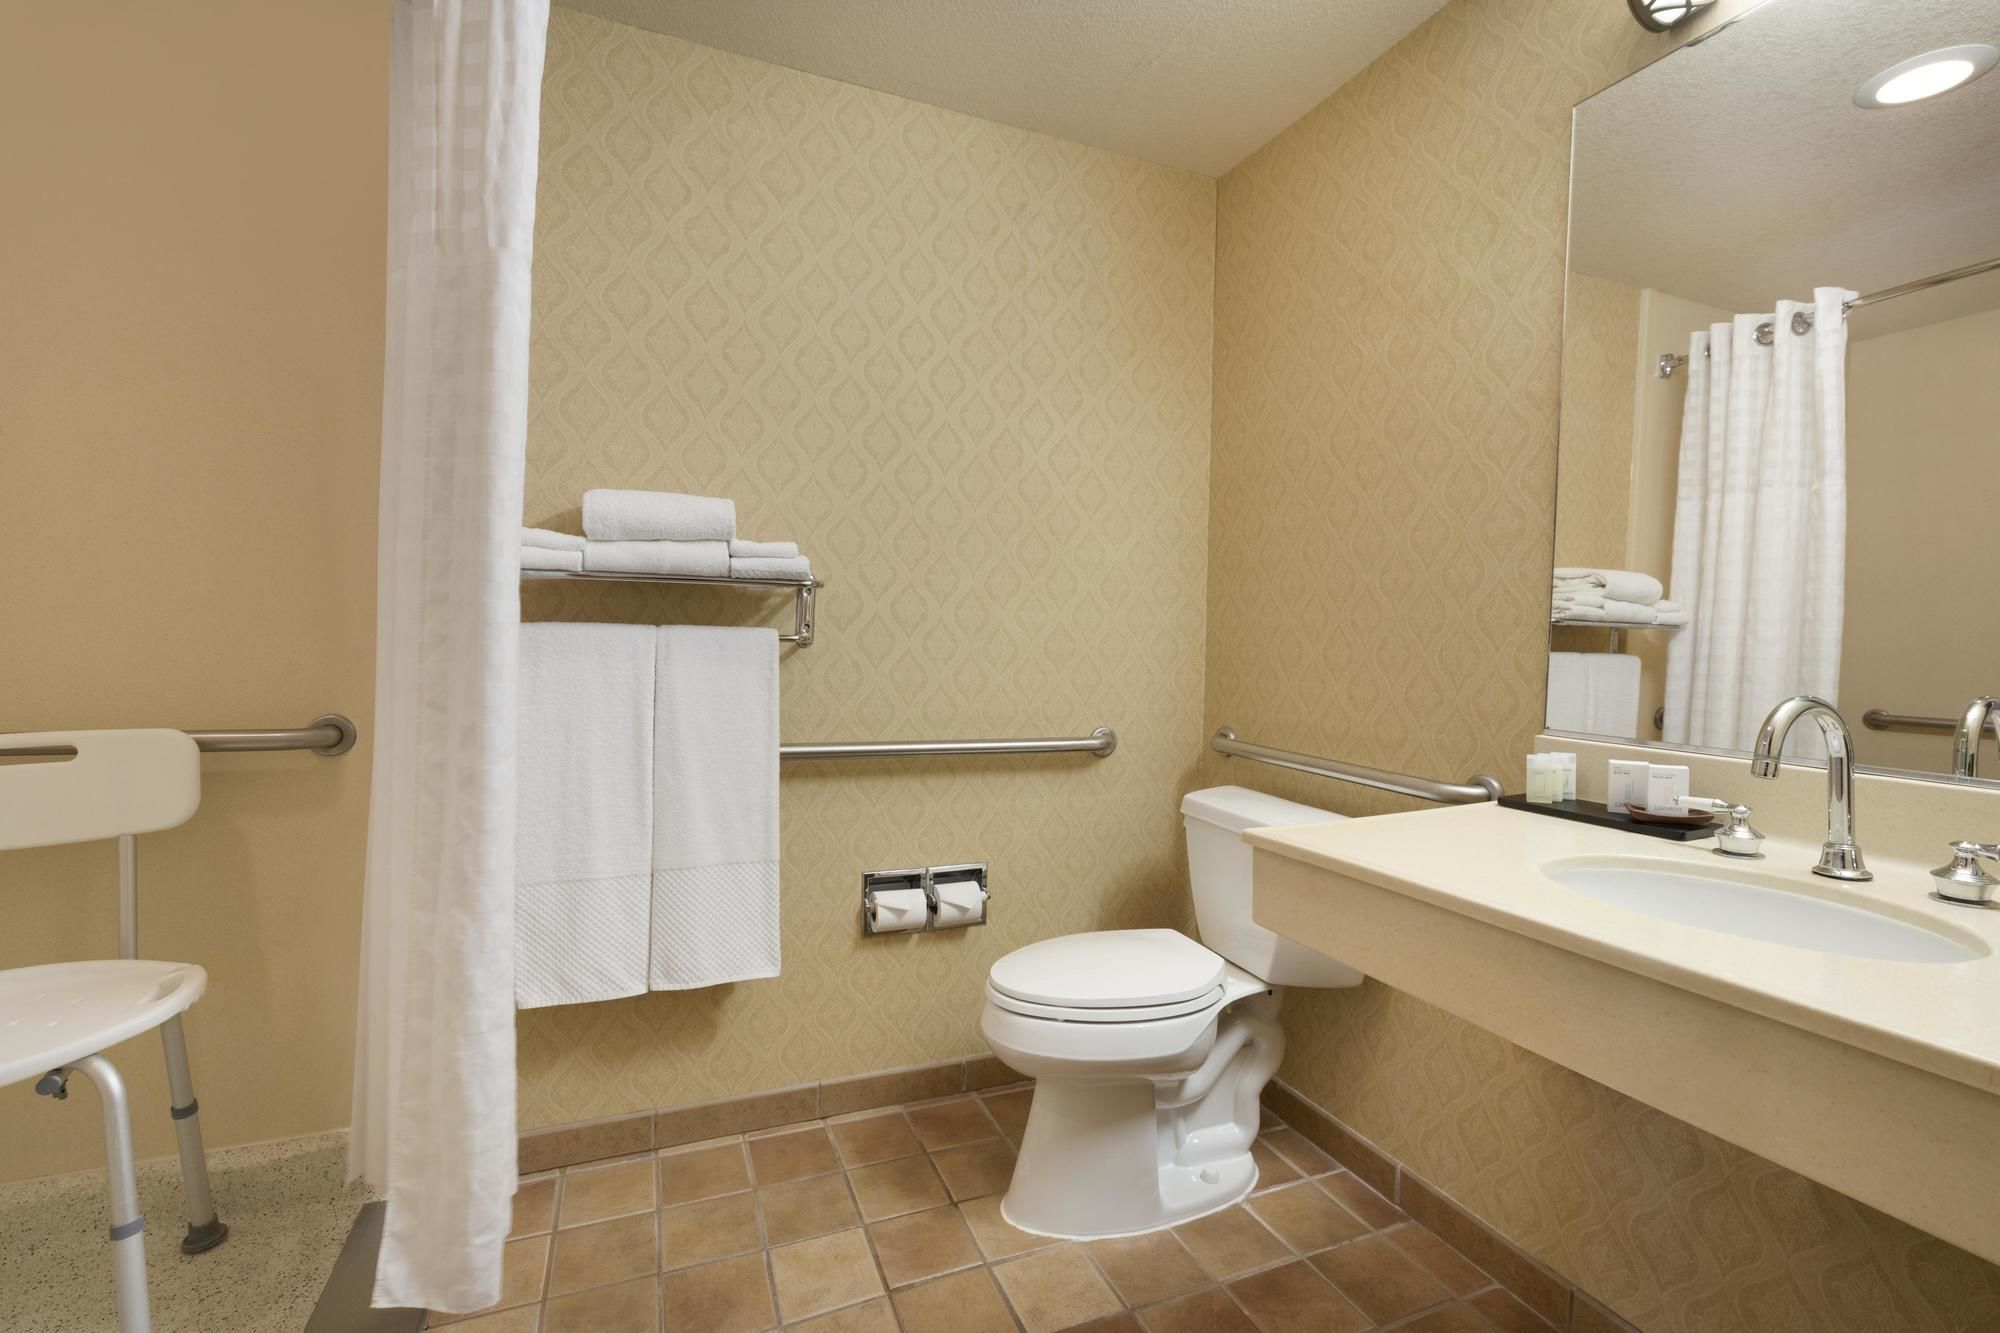 lincoln stay coupons hotel com hotels ne for freehotelcoupons motel nebraska extended